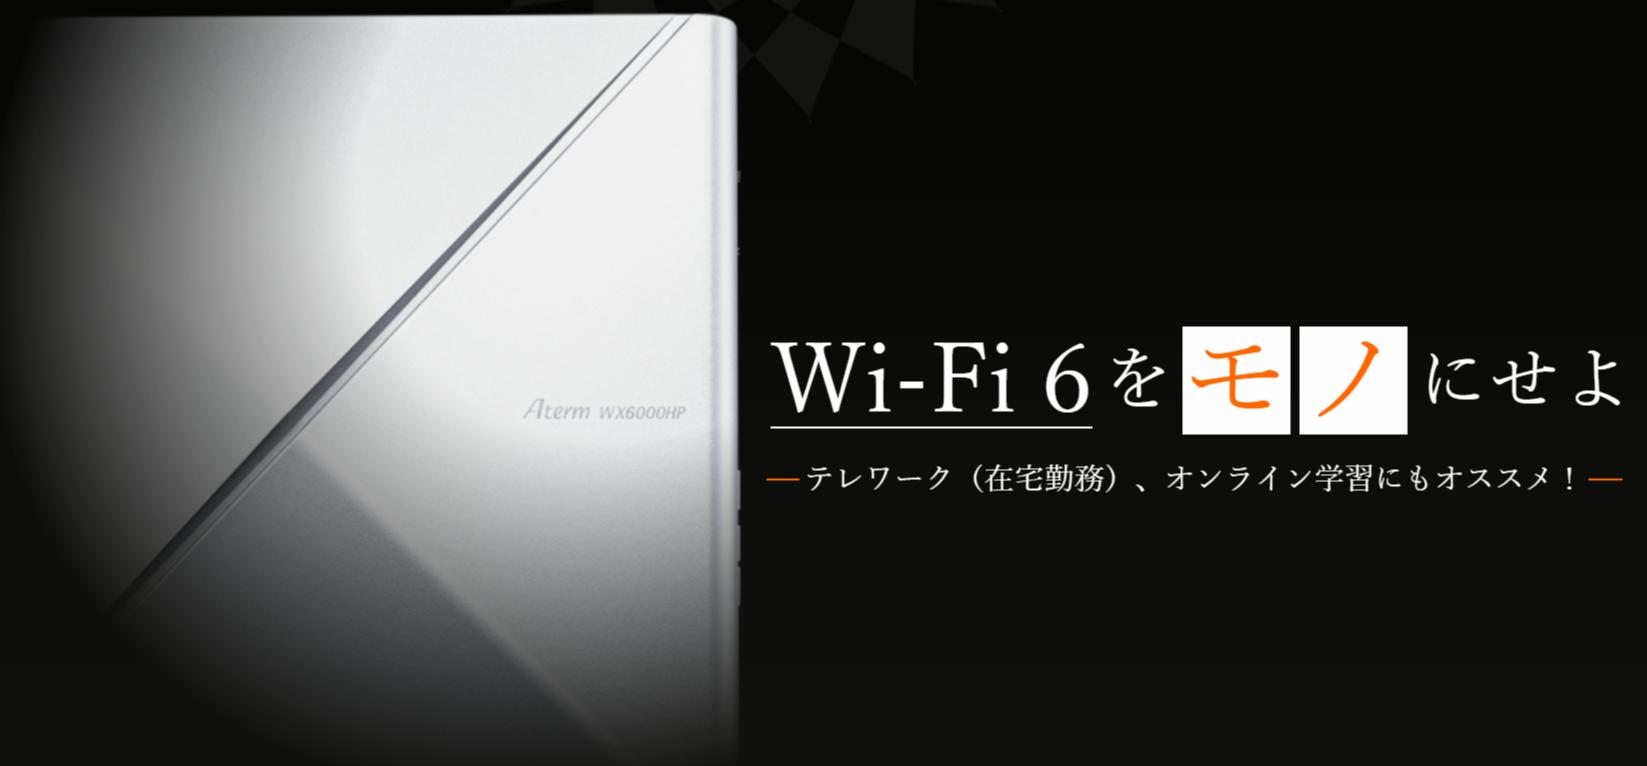 NEC Wi-Fi 6